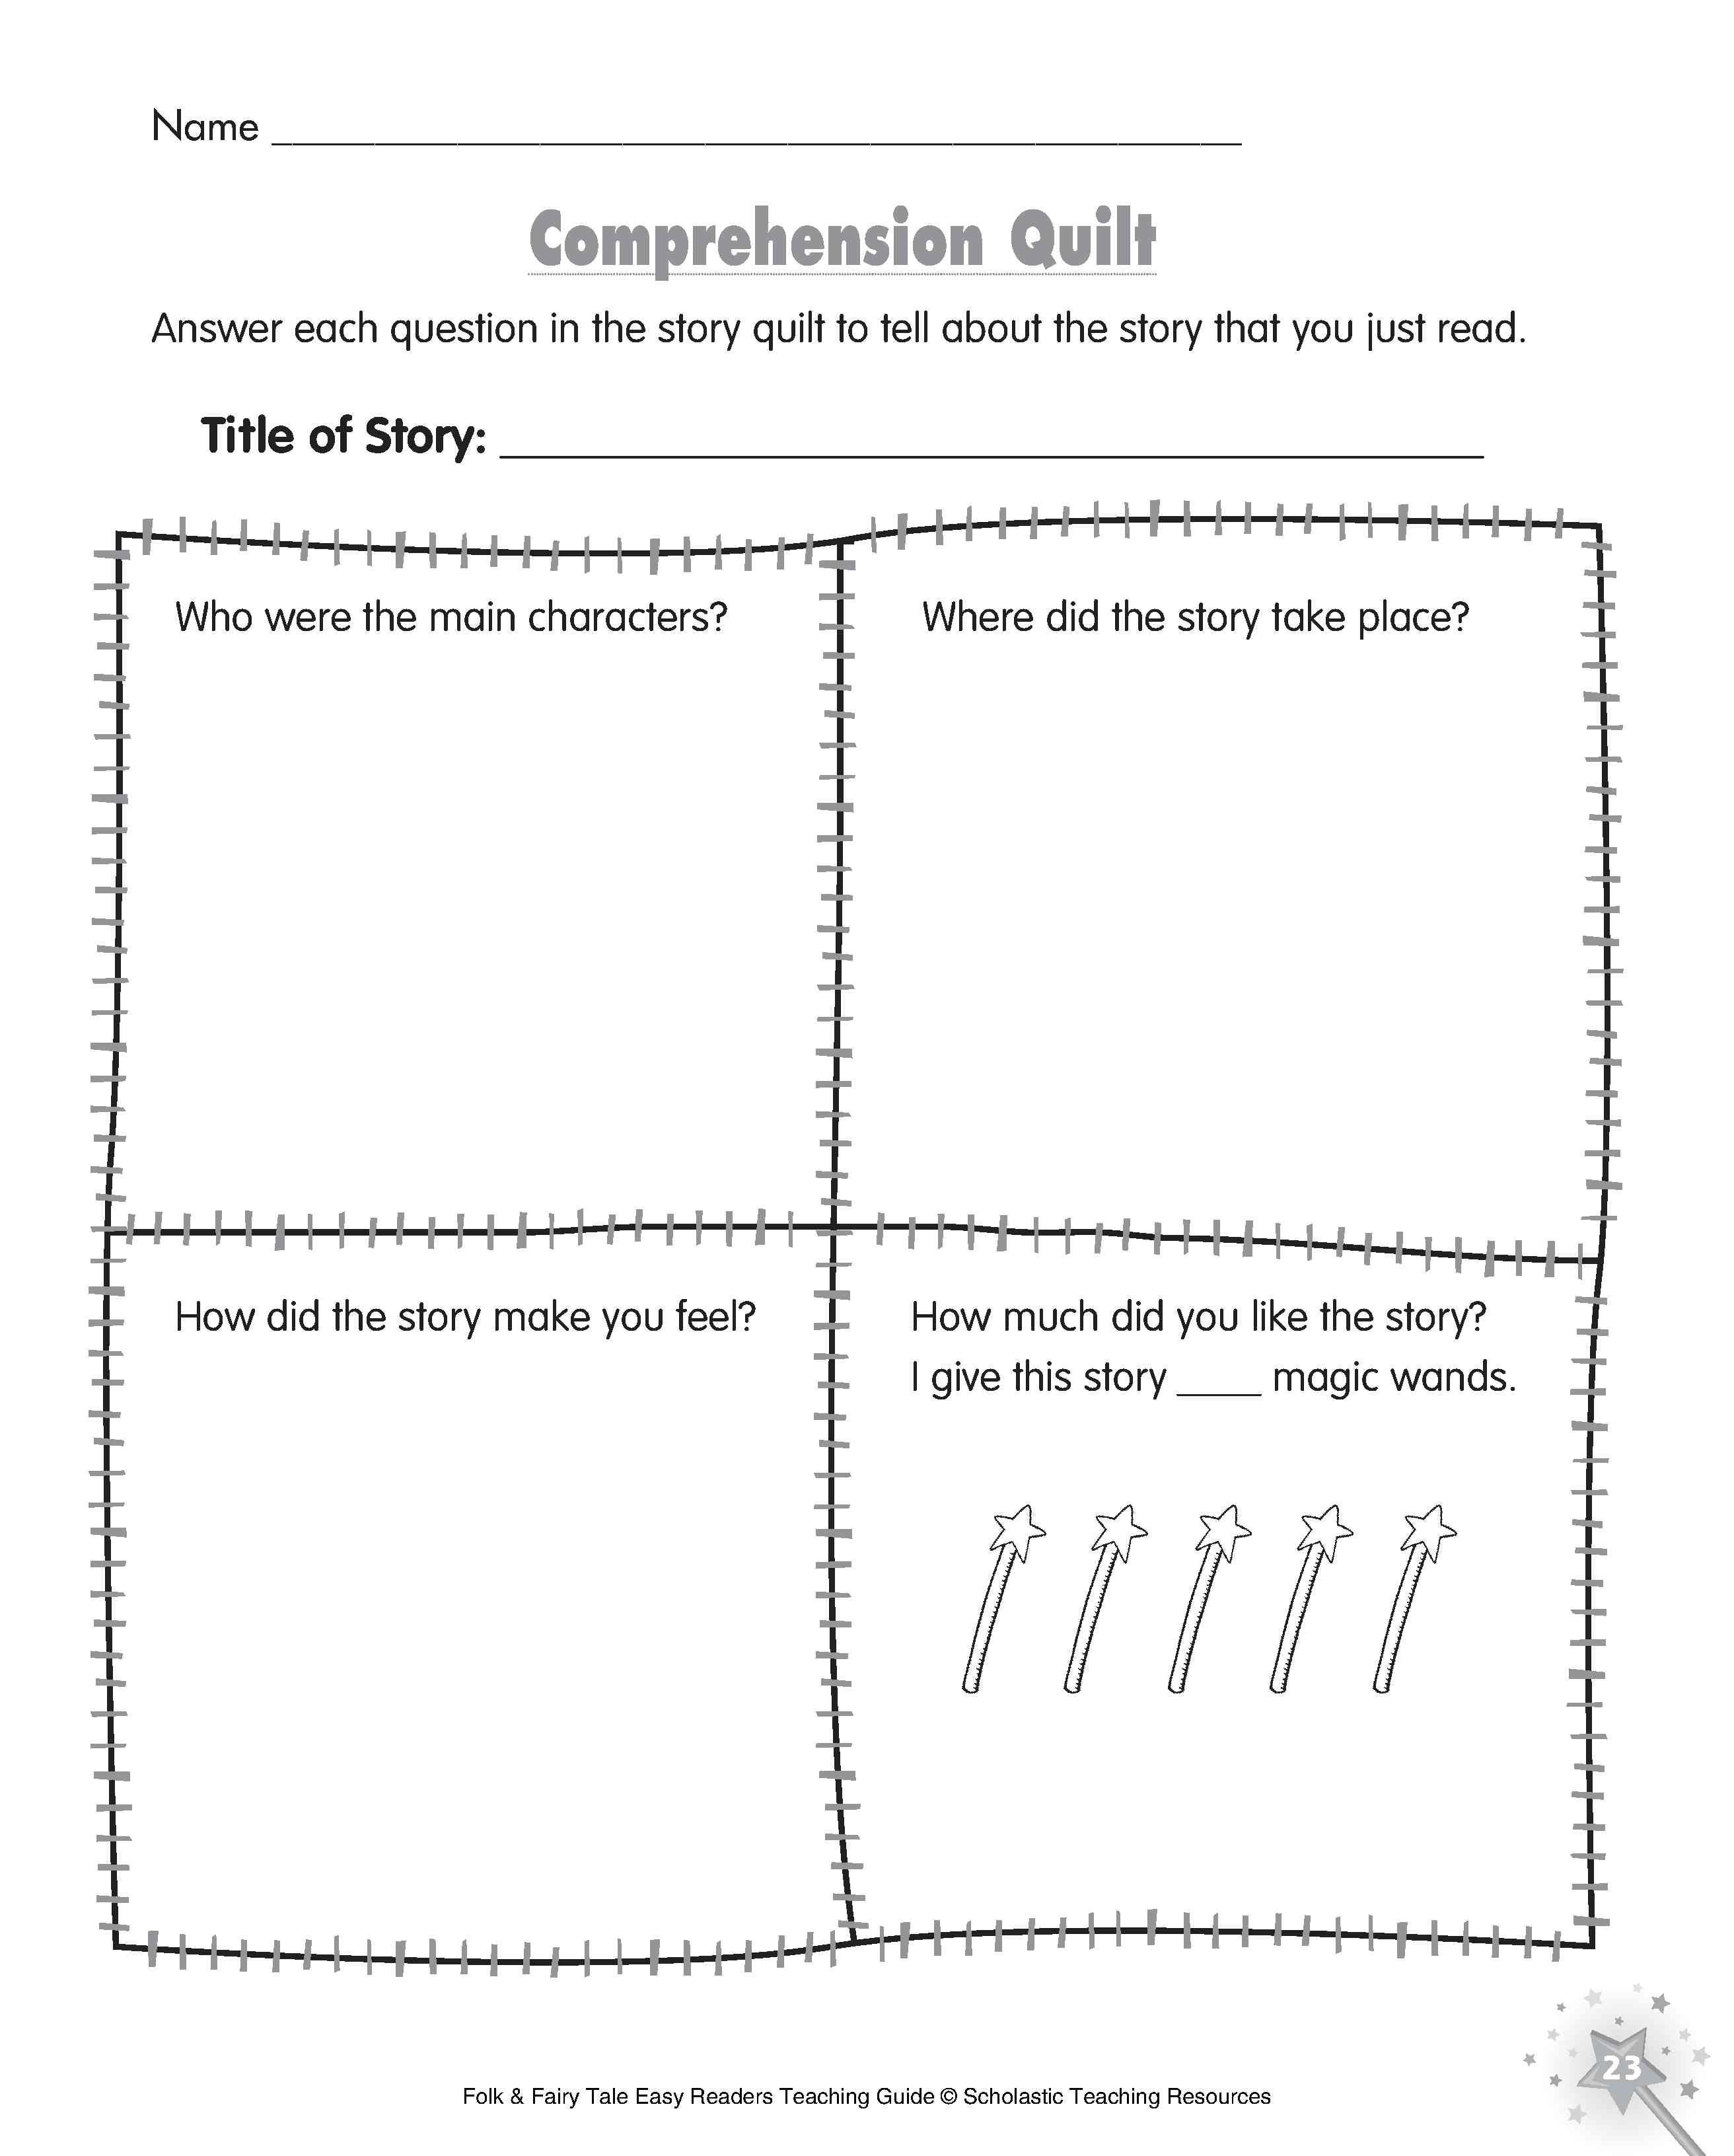 Five Minute Reading Responses | Scholastic - Scholastic Free Printables